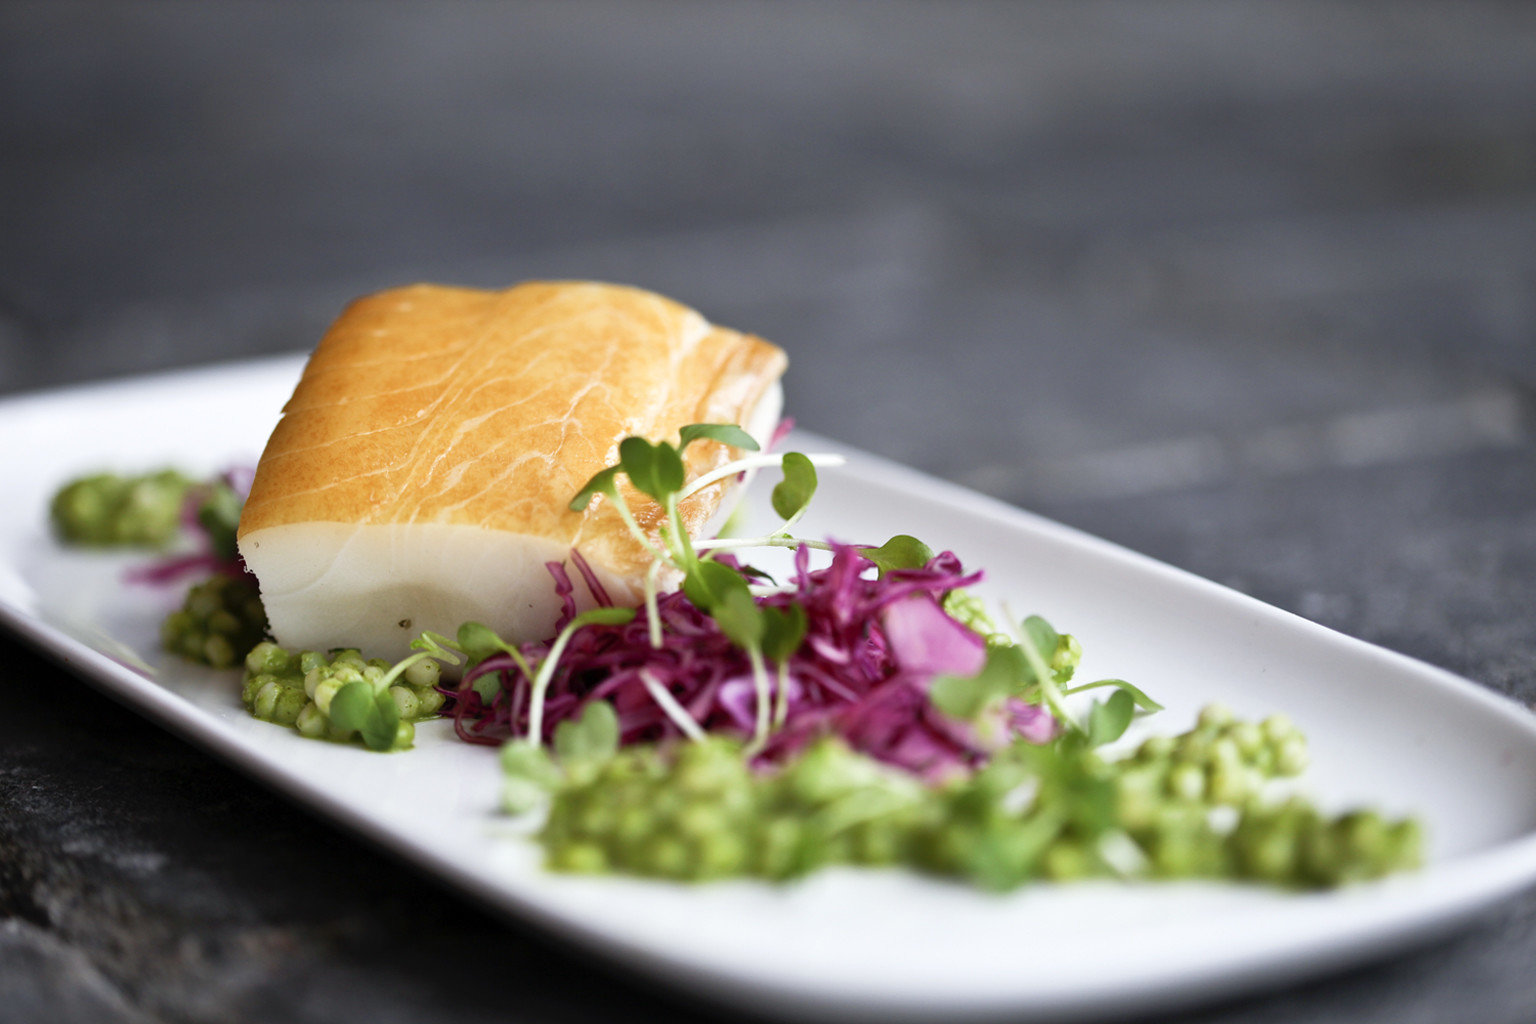 Dining Eat Elegant food plate vegetable cuisine breakfast fresh